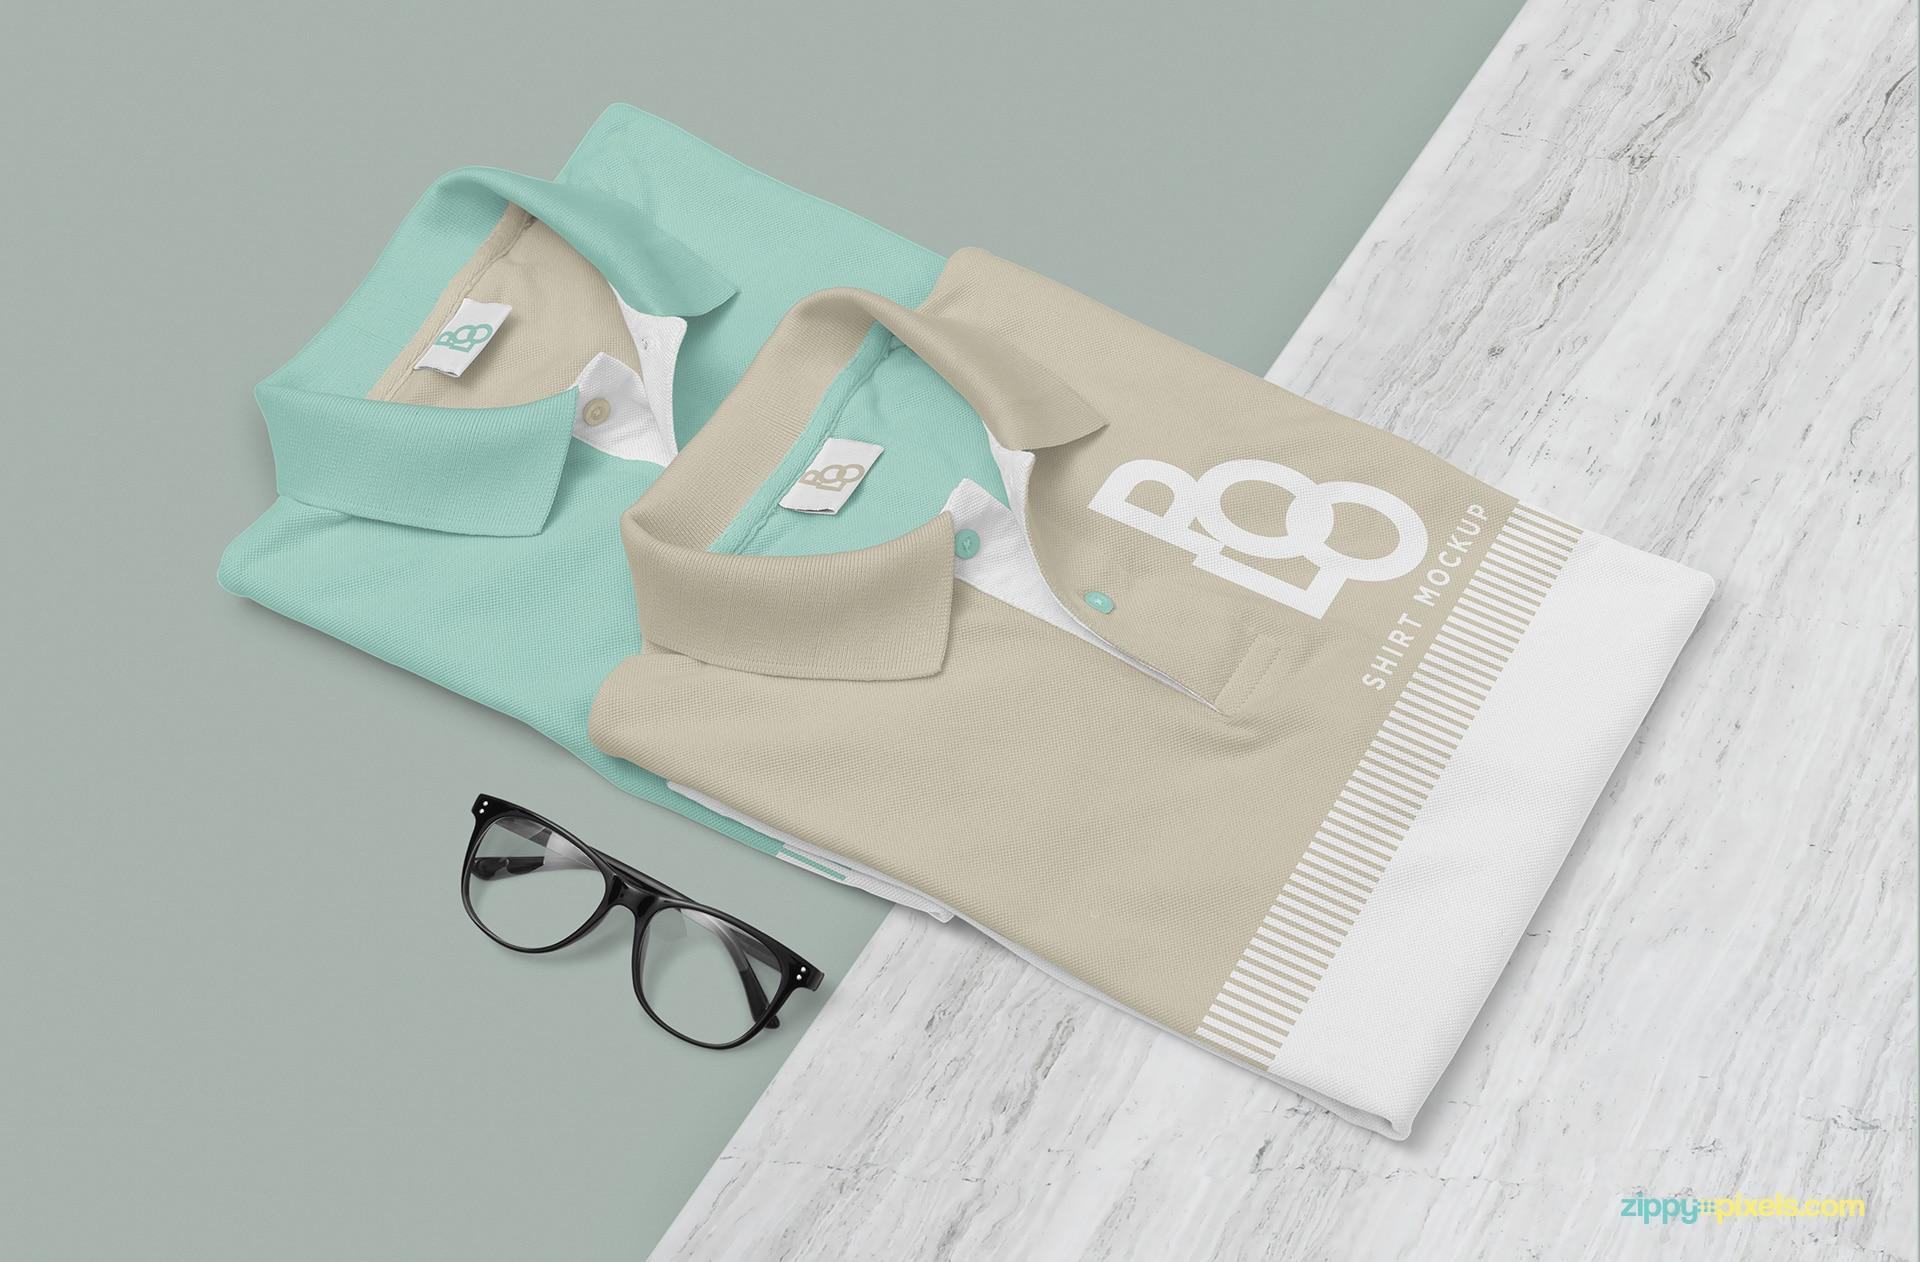 Free Polo T-shirt PSD Mockup Design